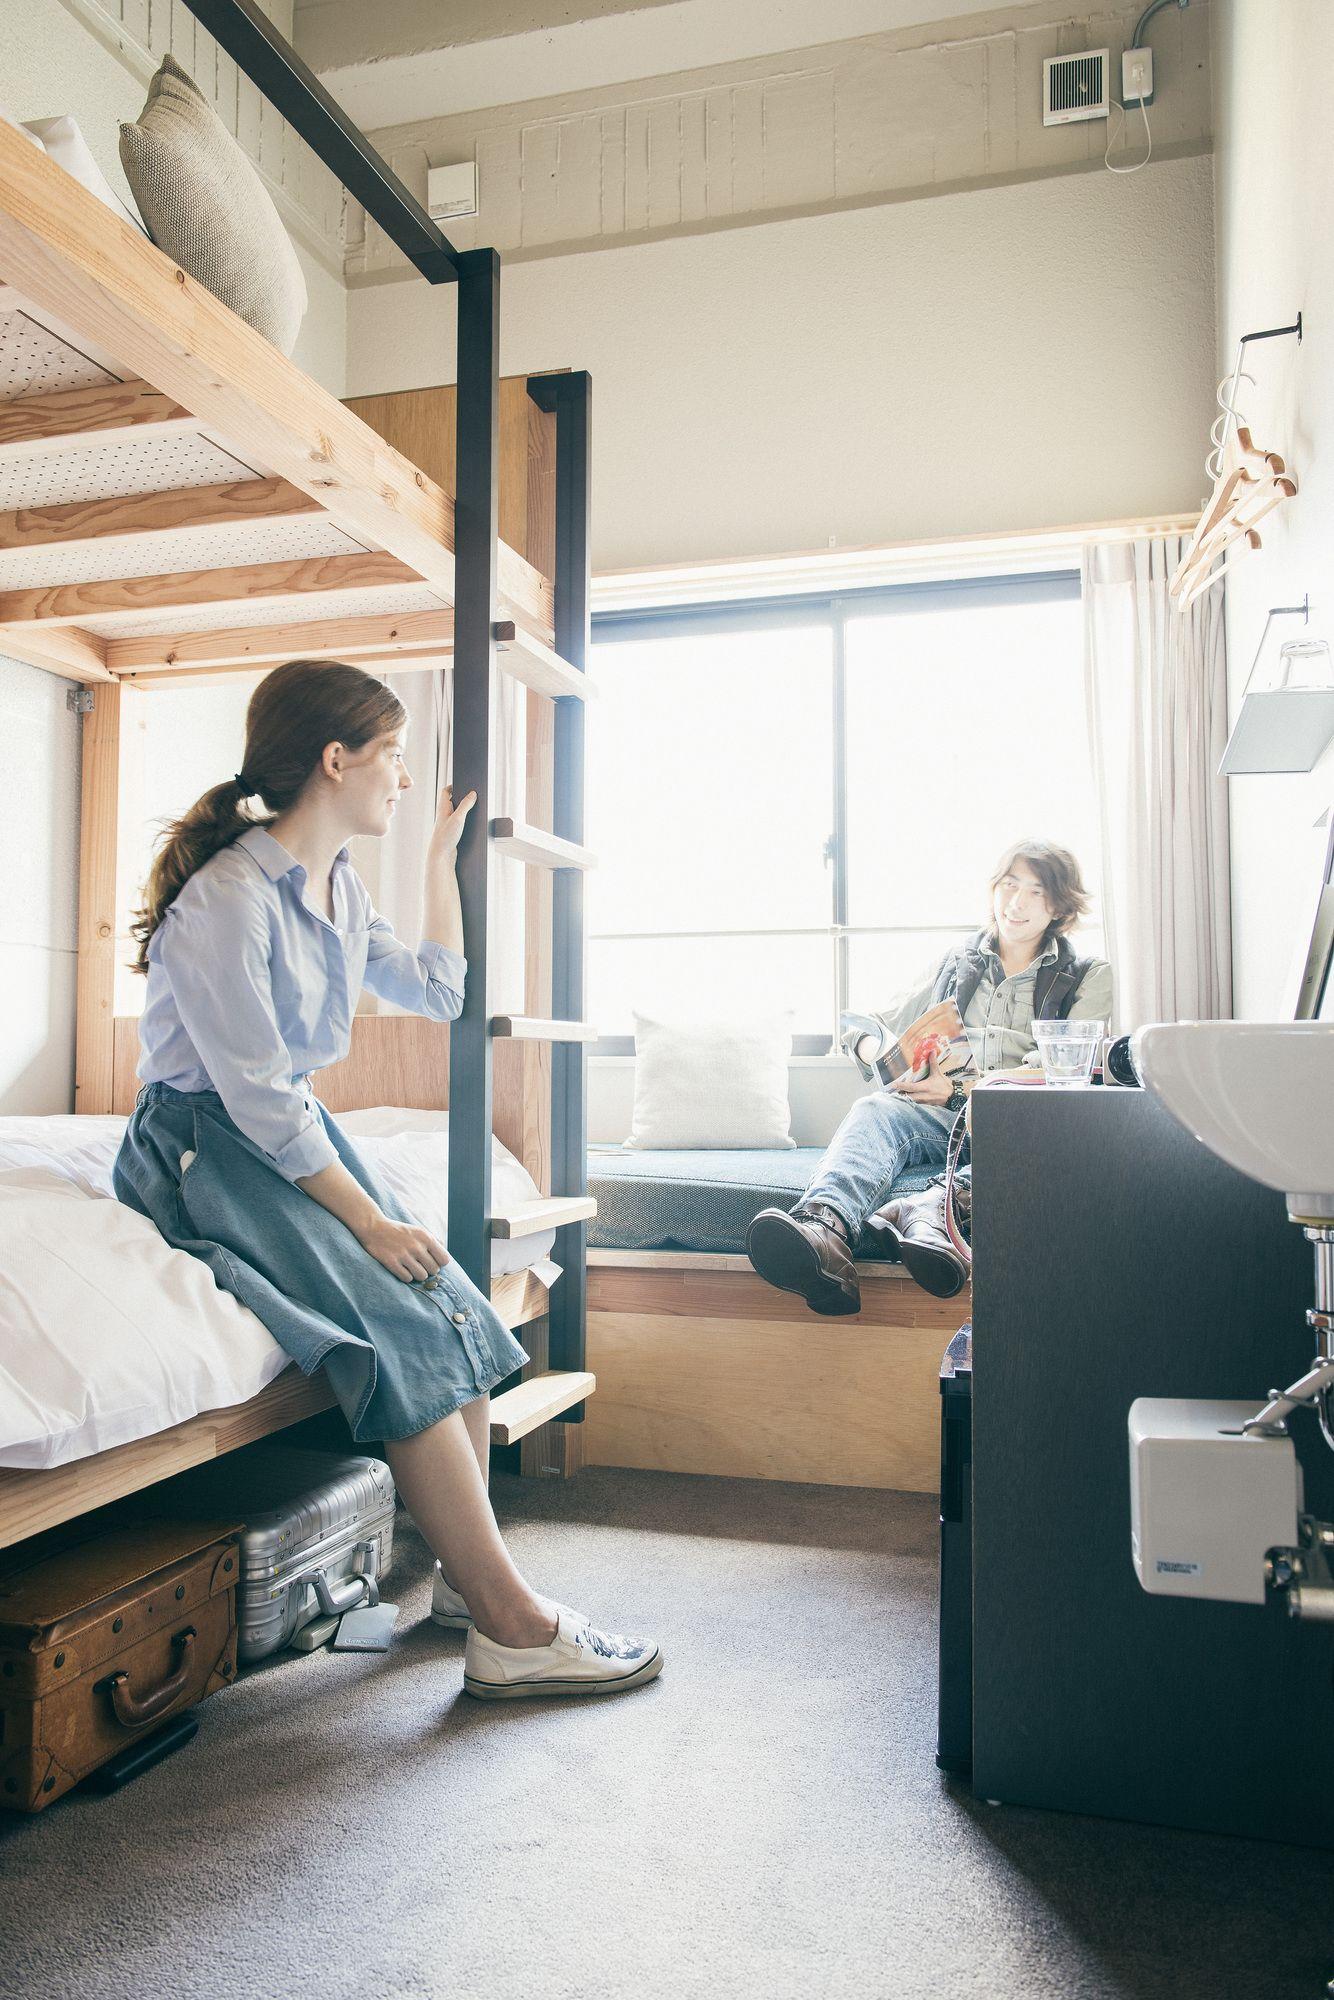 The Share Hotels Hatchi Kanazawa Hostel